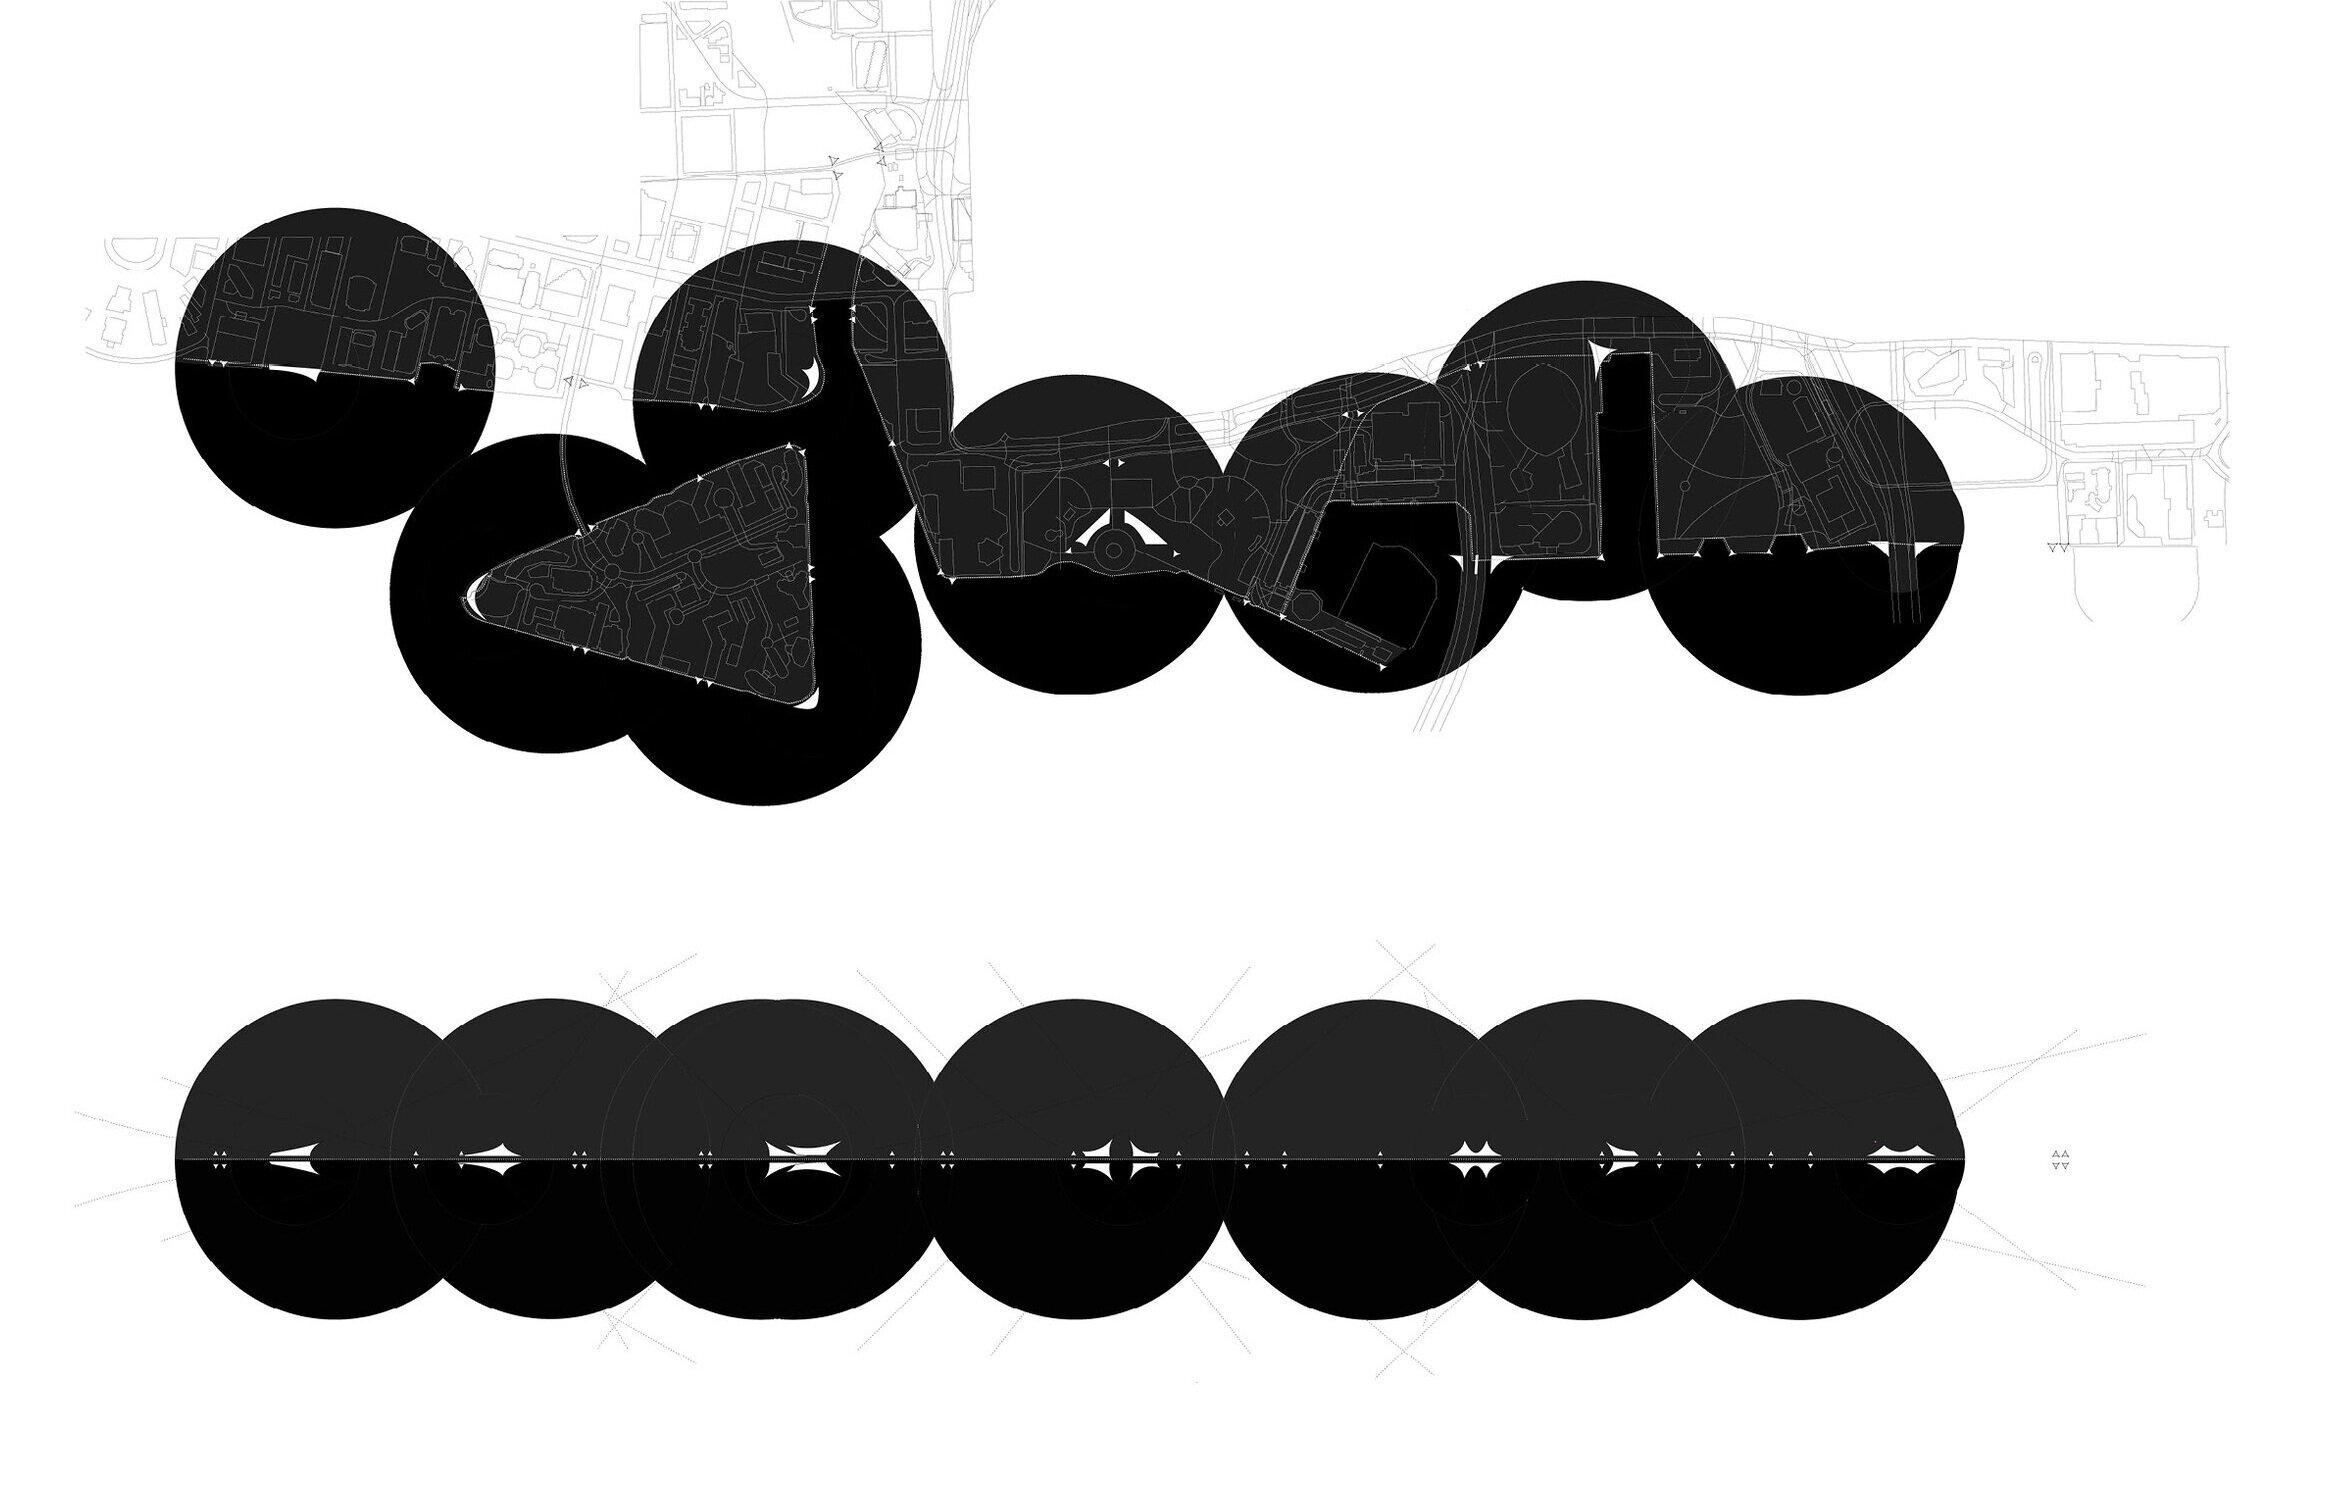 170720 Miami RFP Storyboard Diagrams14.jpg